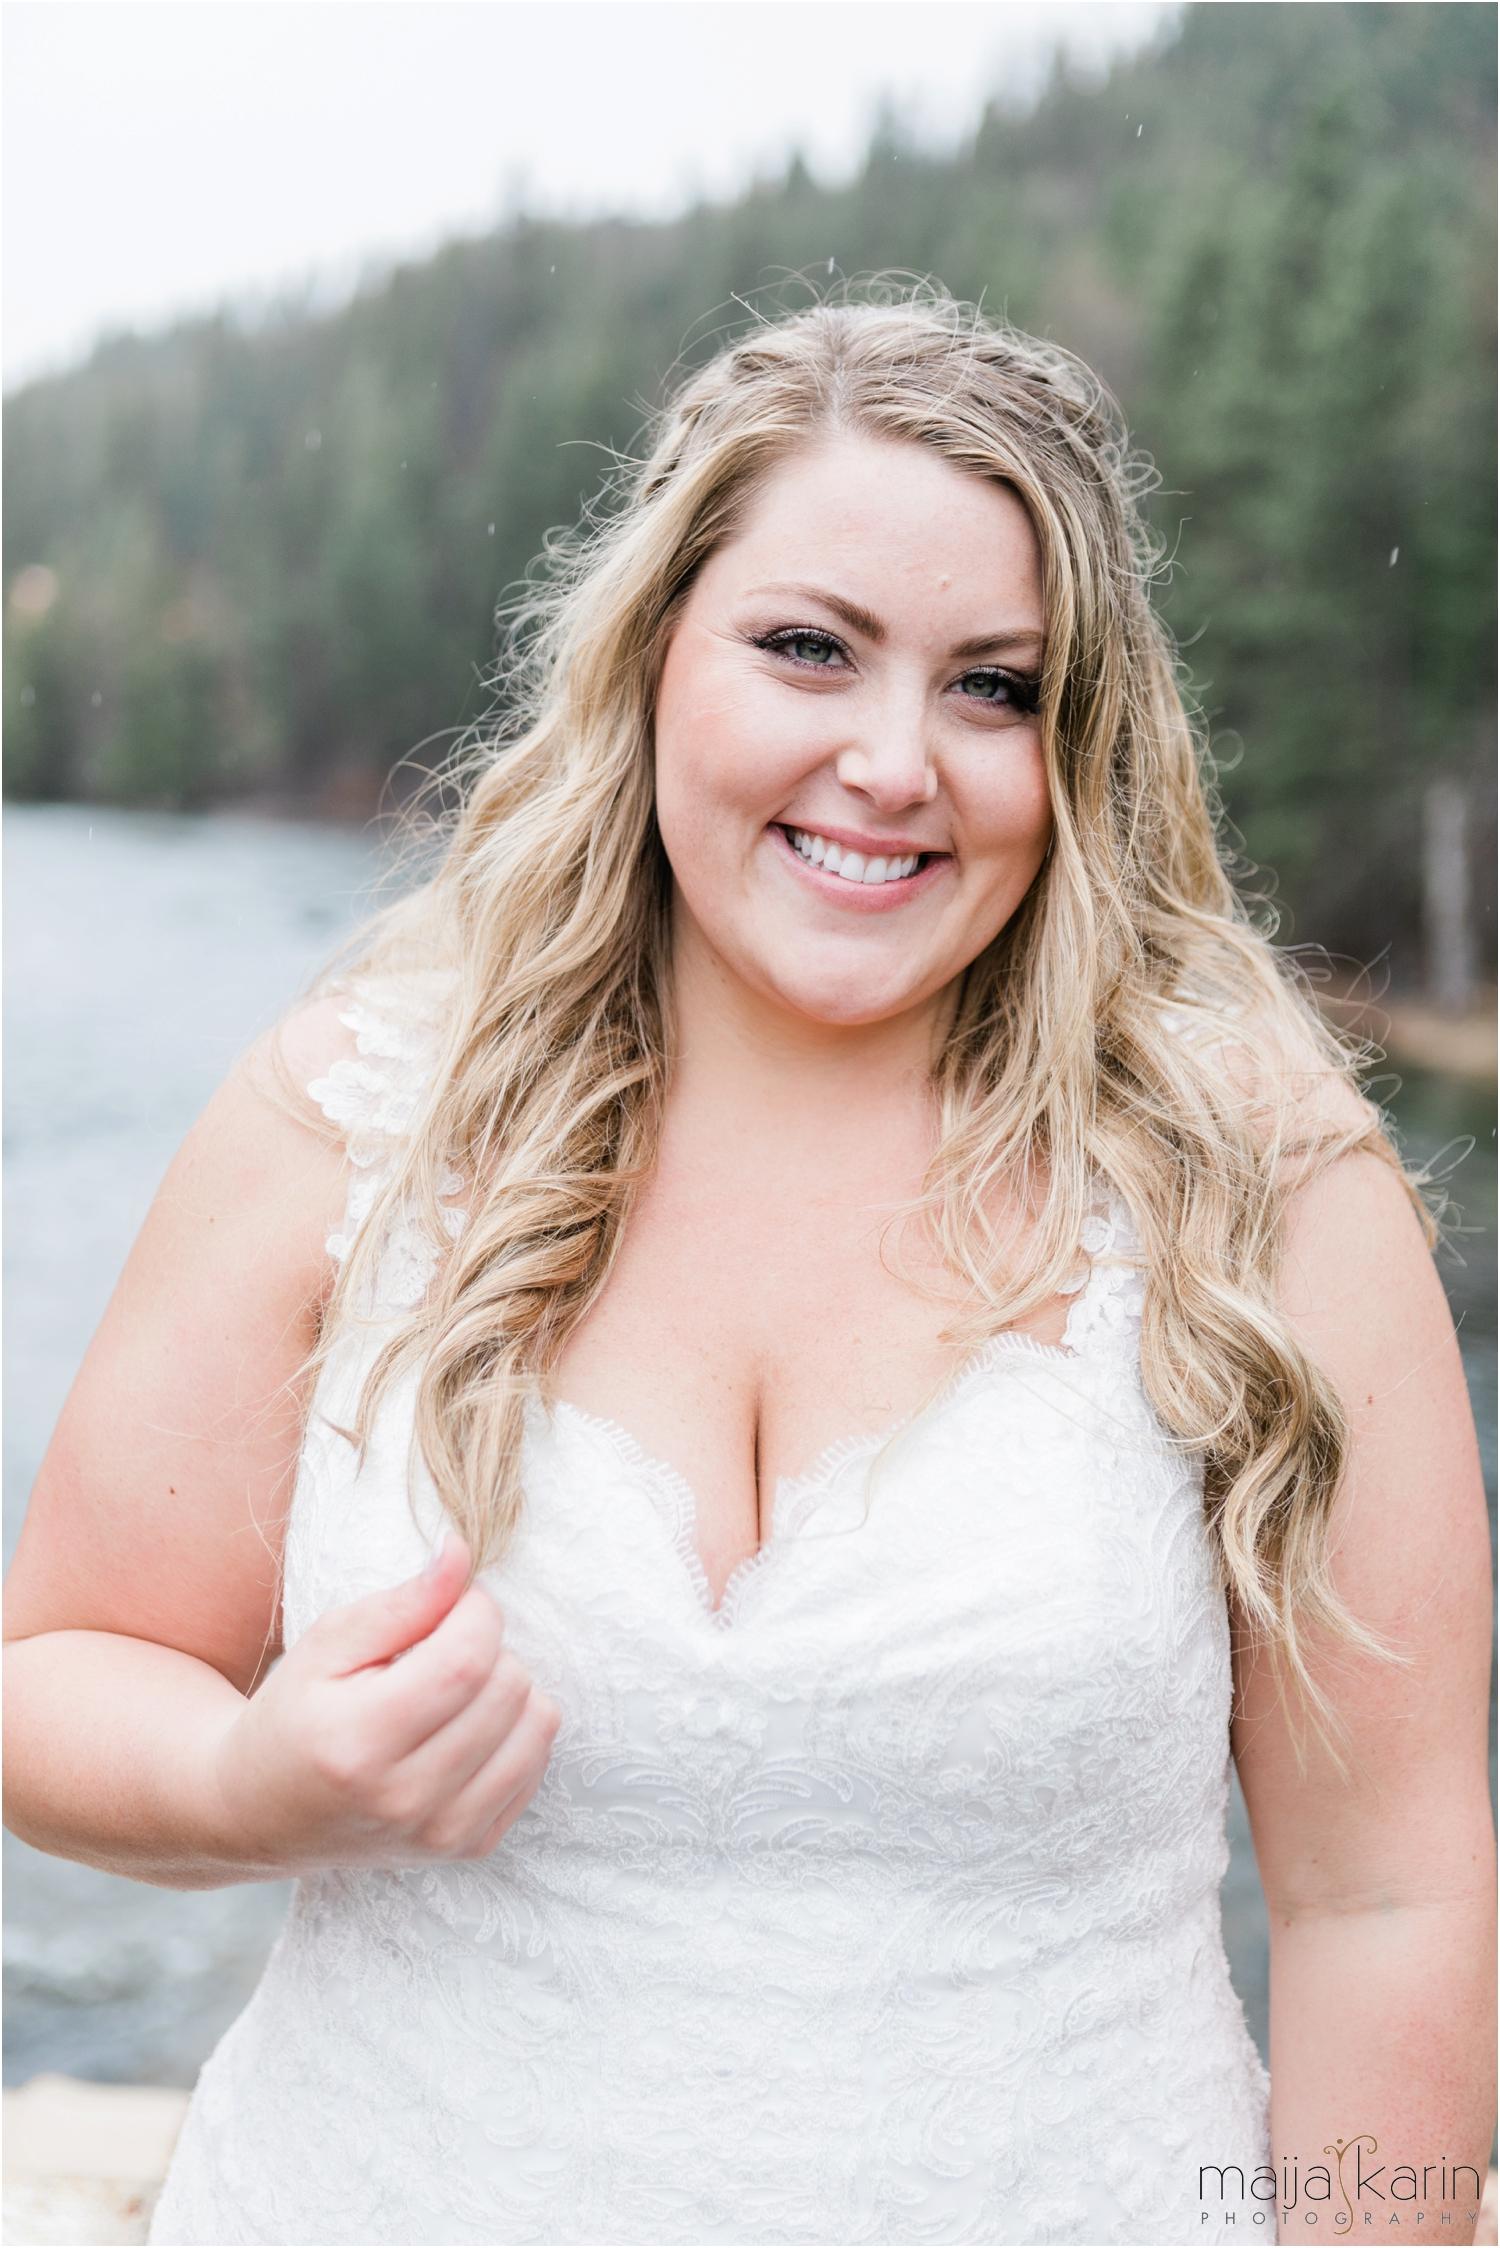 Mountain Springs Lodge wedding Maija Karin Photography%0DMaija Karin Photography%0DMaija Karin Photography%0DMountain-Springs-Lodge-Wedding-Maija-Karin-Photography_0026.jpg